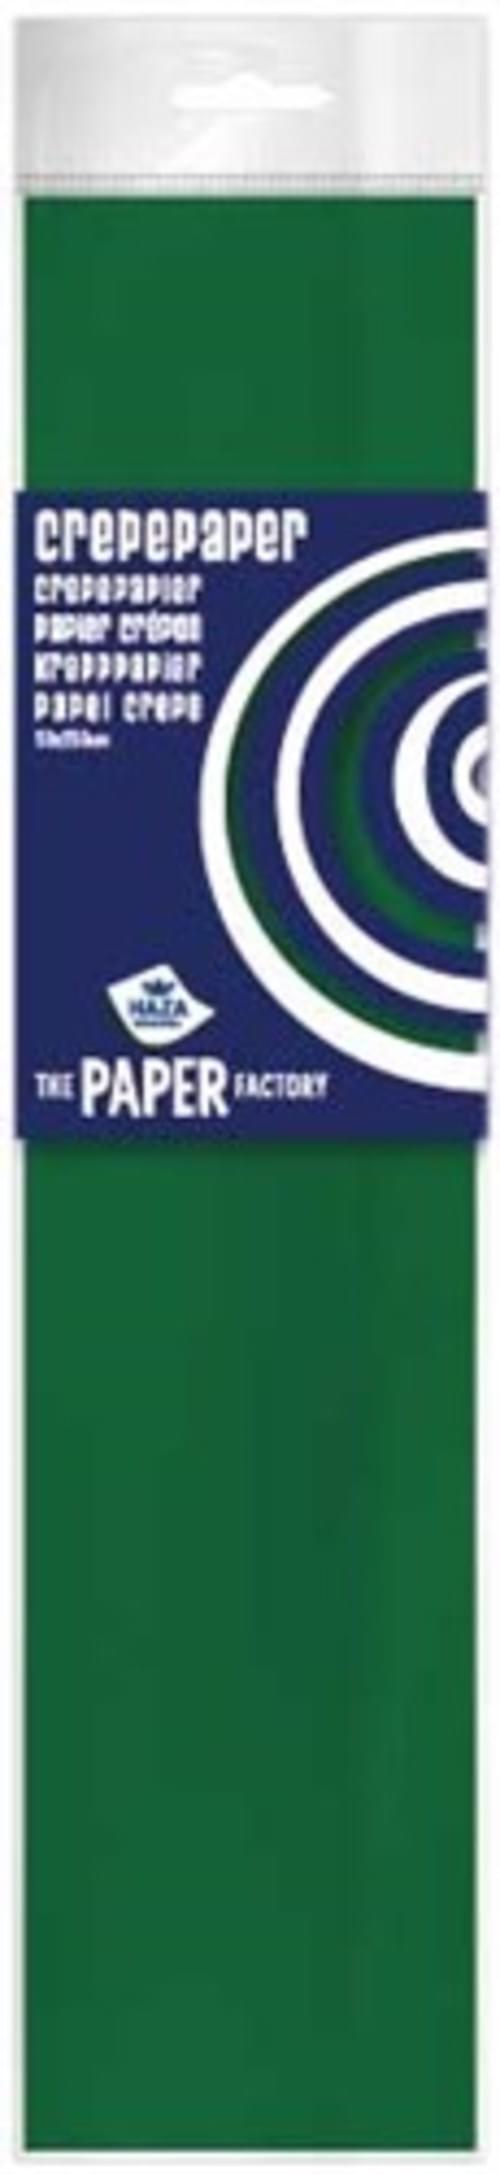 Crepe Paper Xmasgreen  10pk